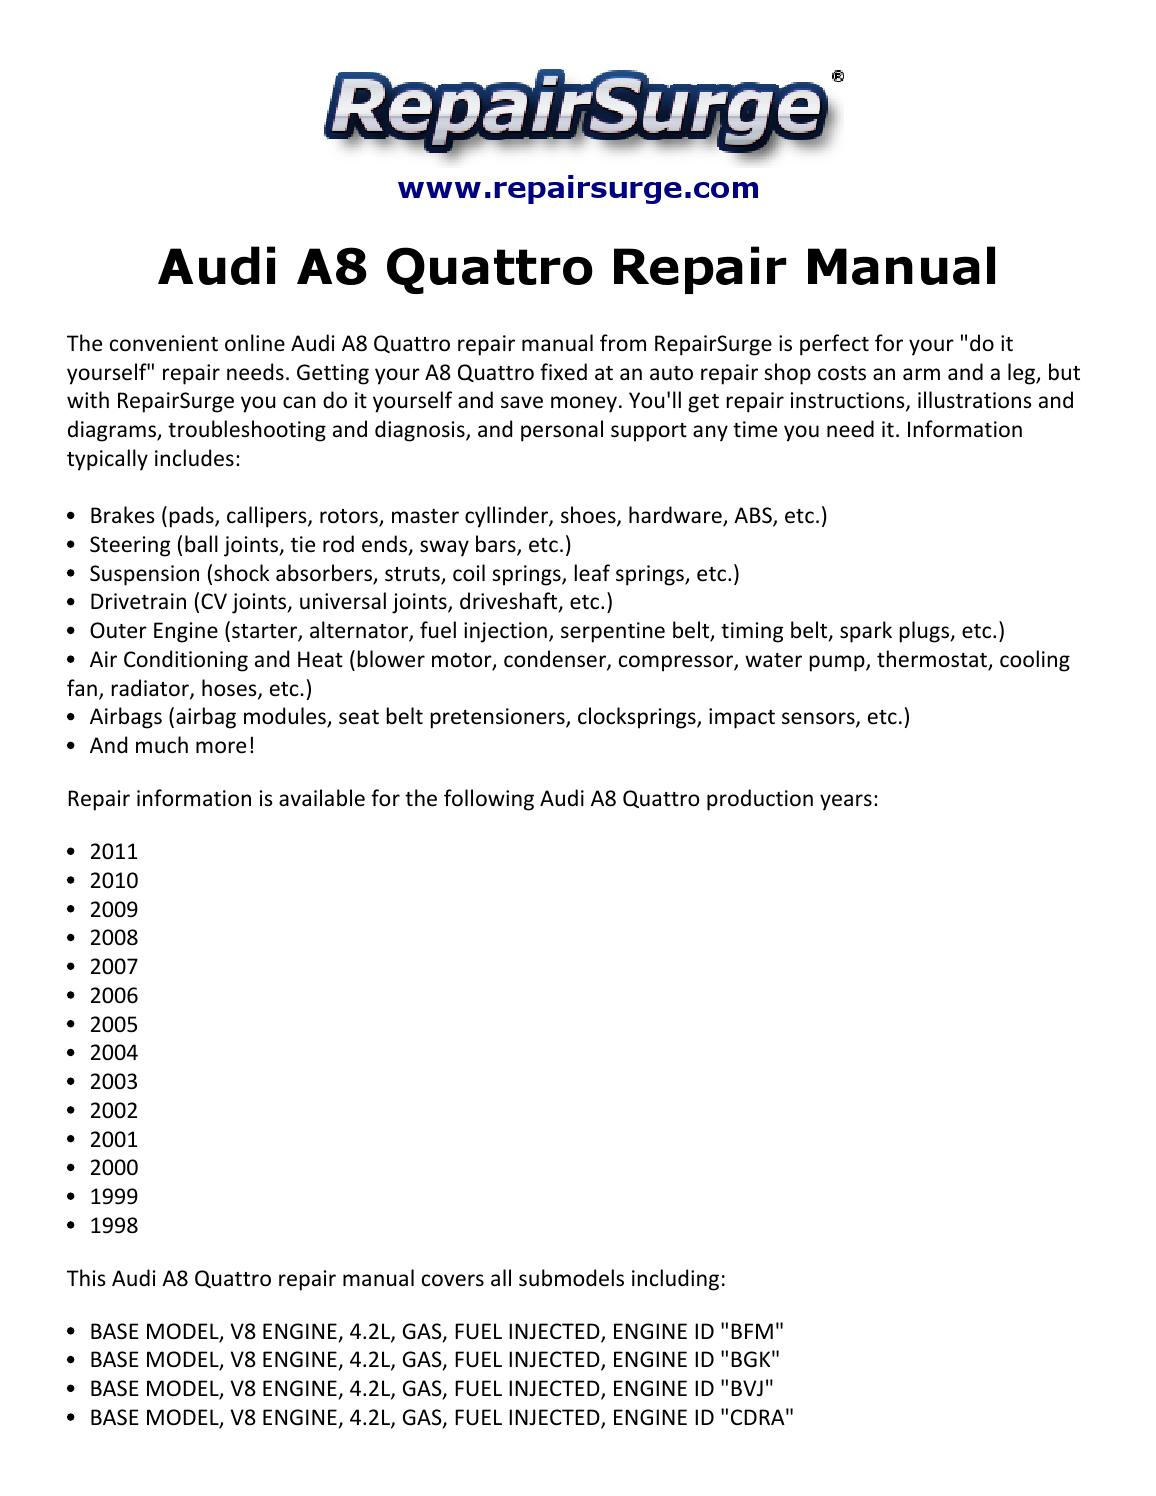 Audi A8 Quattro Repair Manual 1998 2011 By Jasper2334 Issuu V8 Engine Diagram